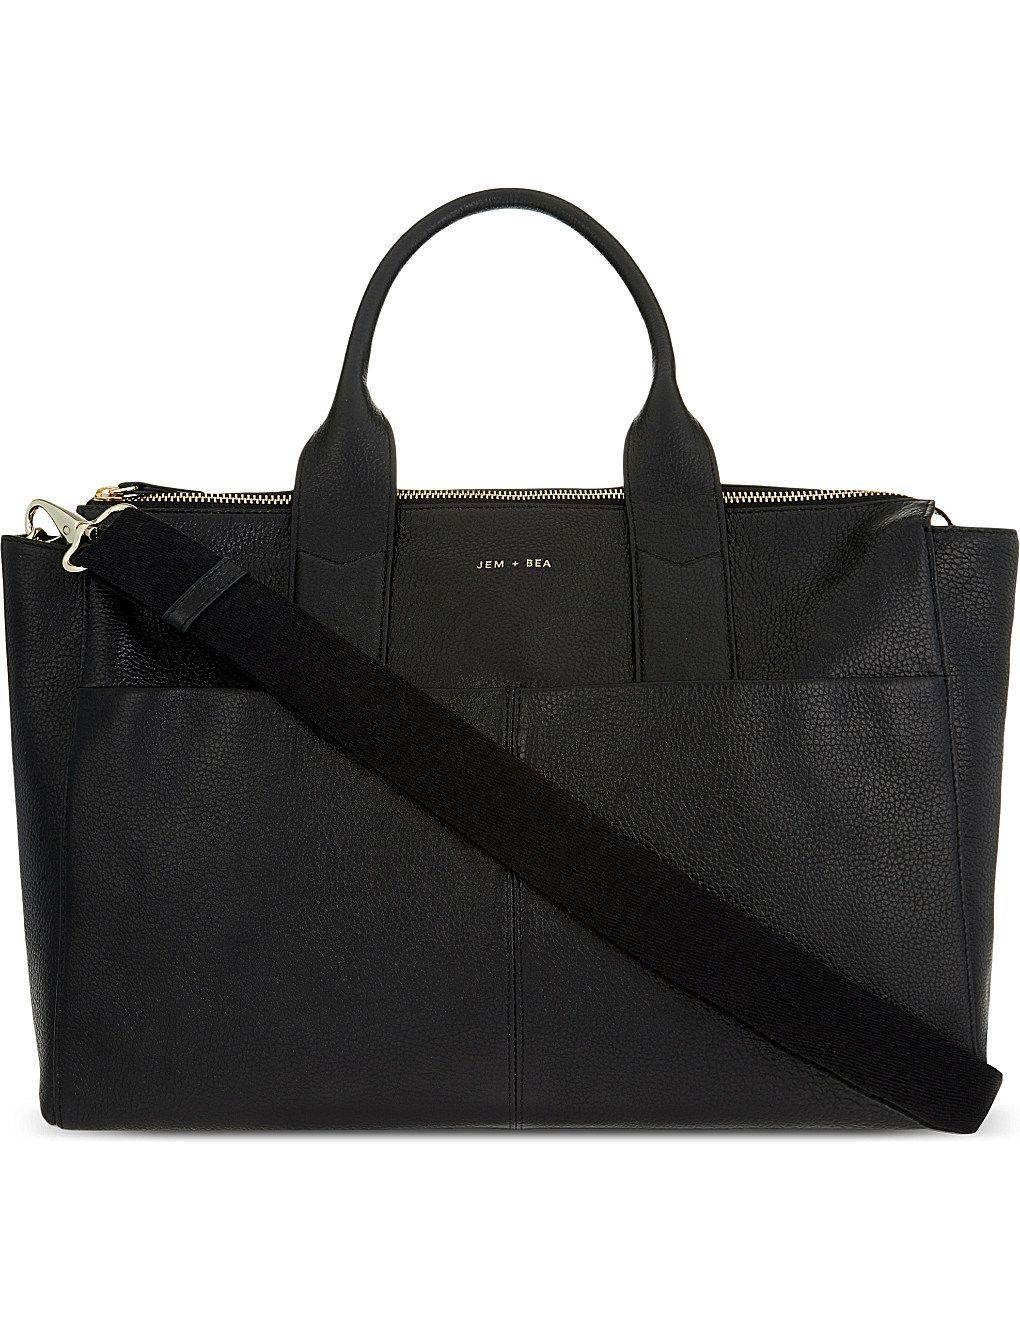 e80b45471f30 JEM + BEA Jemima leather changing bag | Little Human | Leather ...